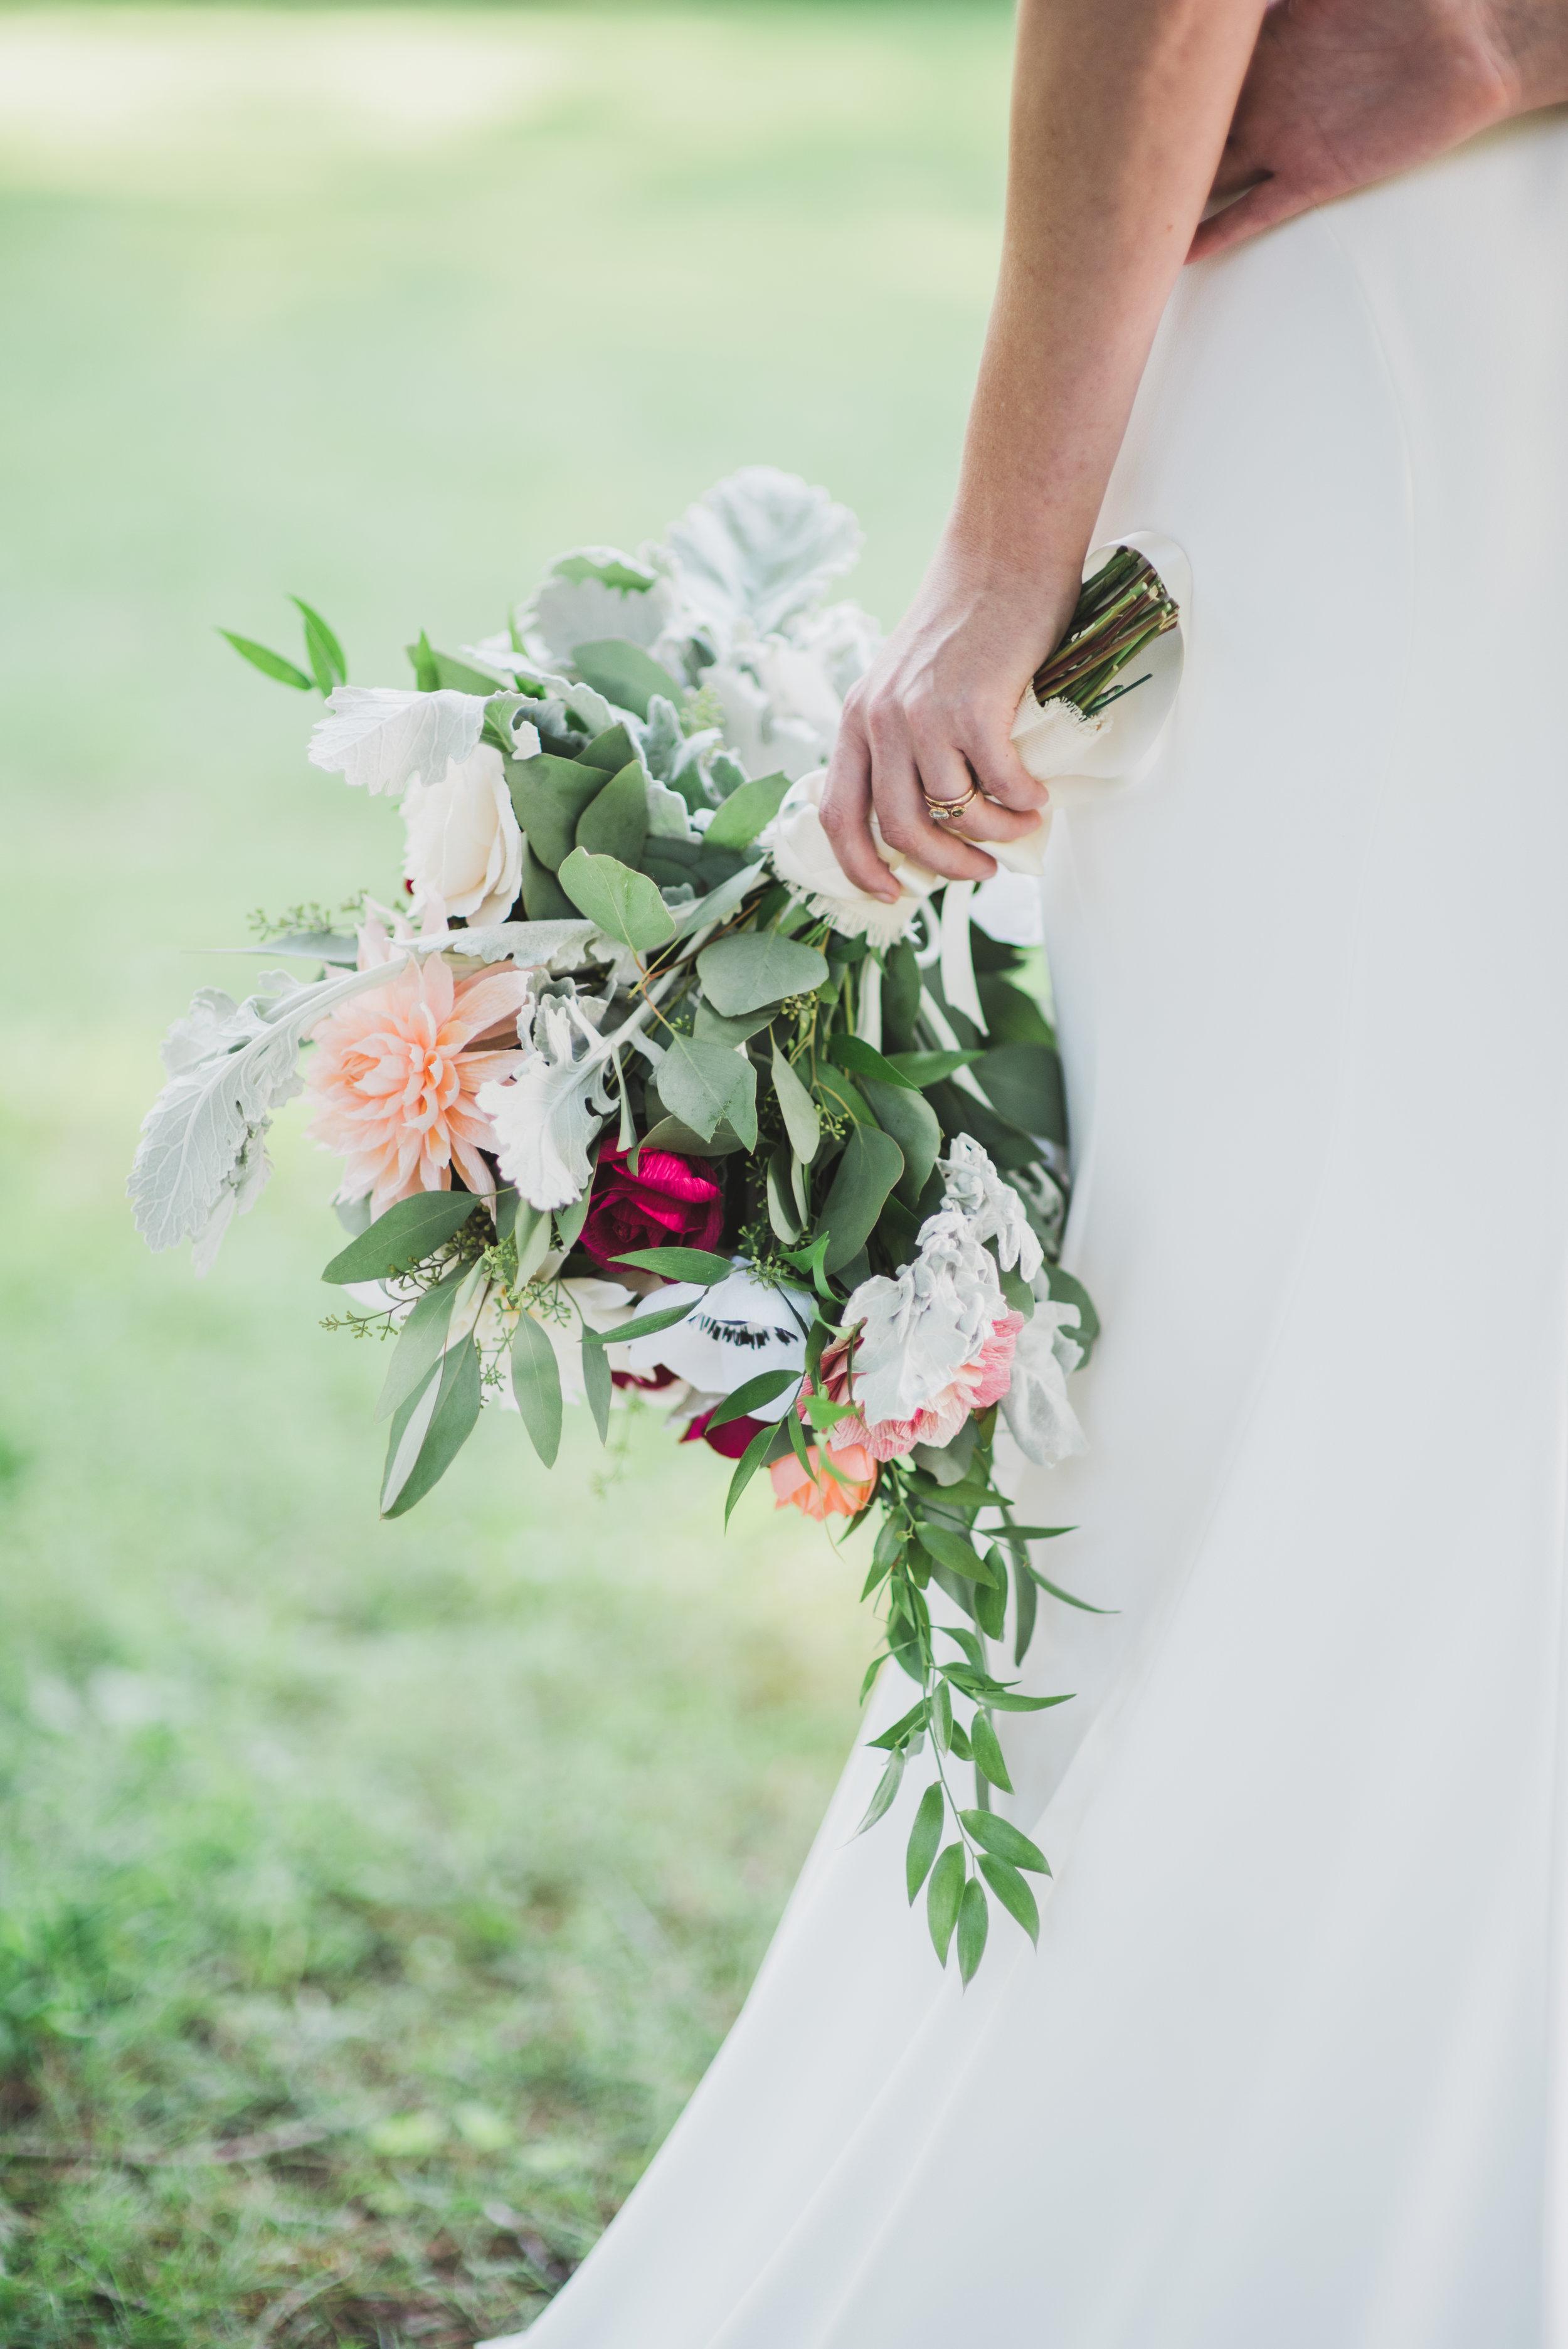 Elegant Garden Wedding Photo Shoot: bouquet